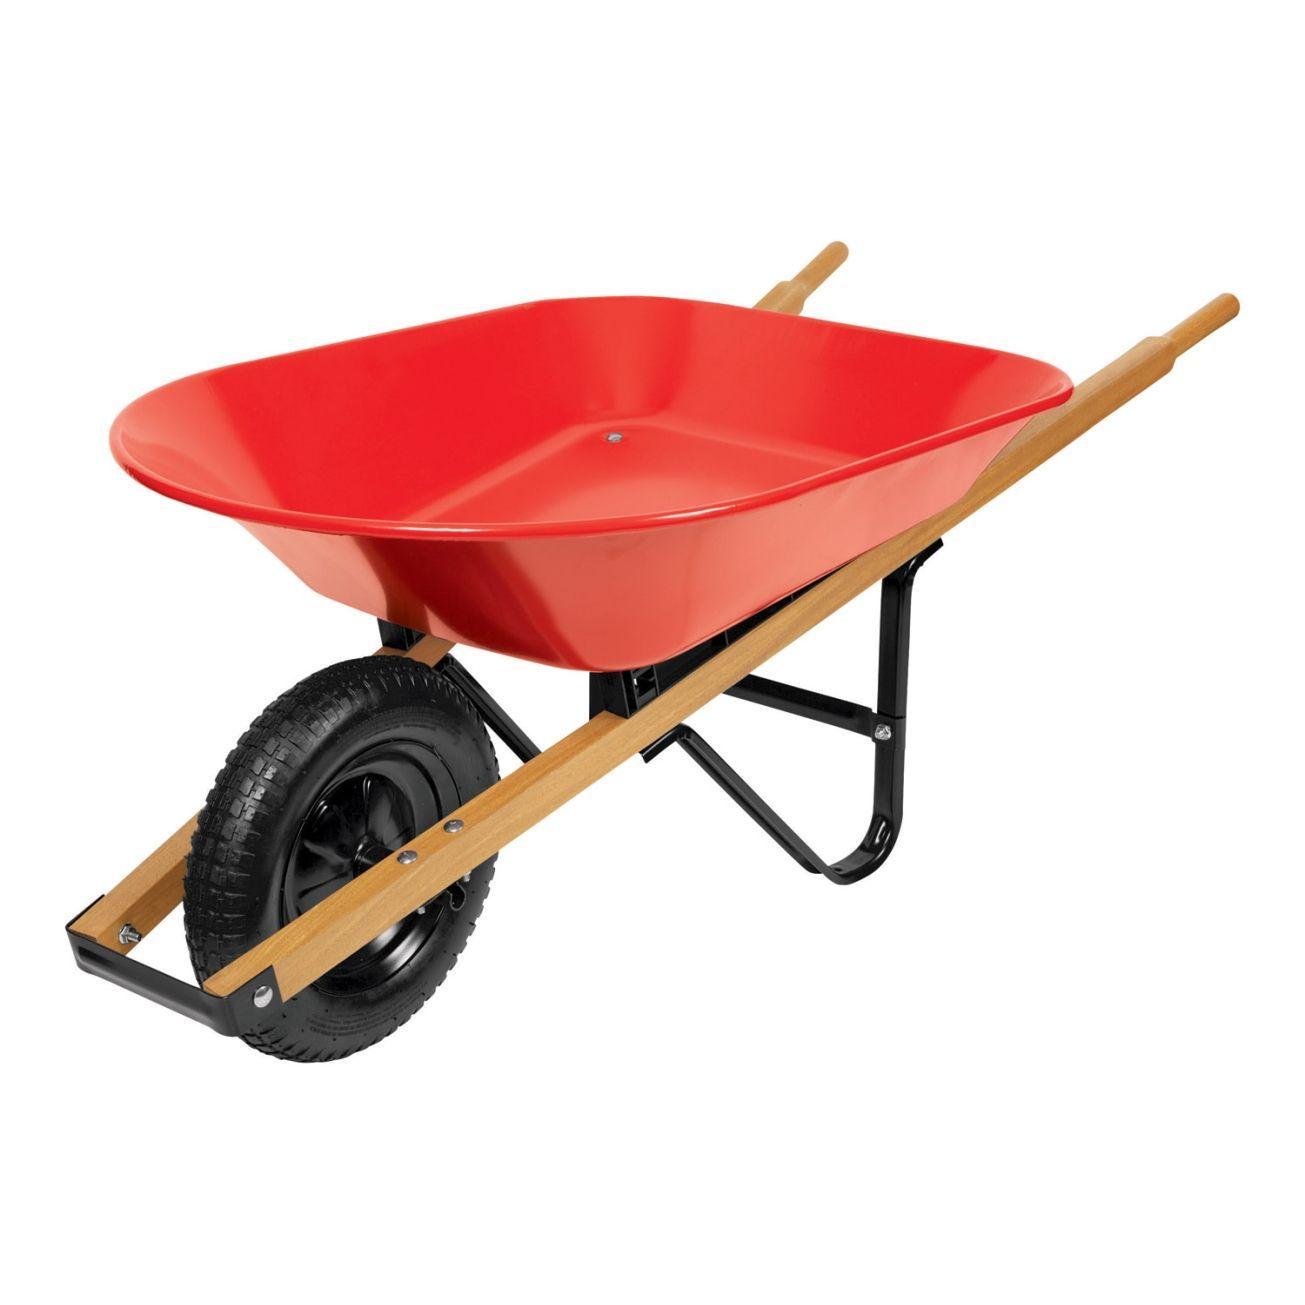 Ace Steel Single Wheel Wheelbarrow 4 Cu Ft 4s Ls Ace Wheelbarrows Ace Hardware Wheelbarrow Home Improvement Home Buying